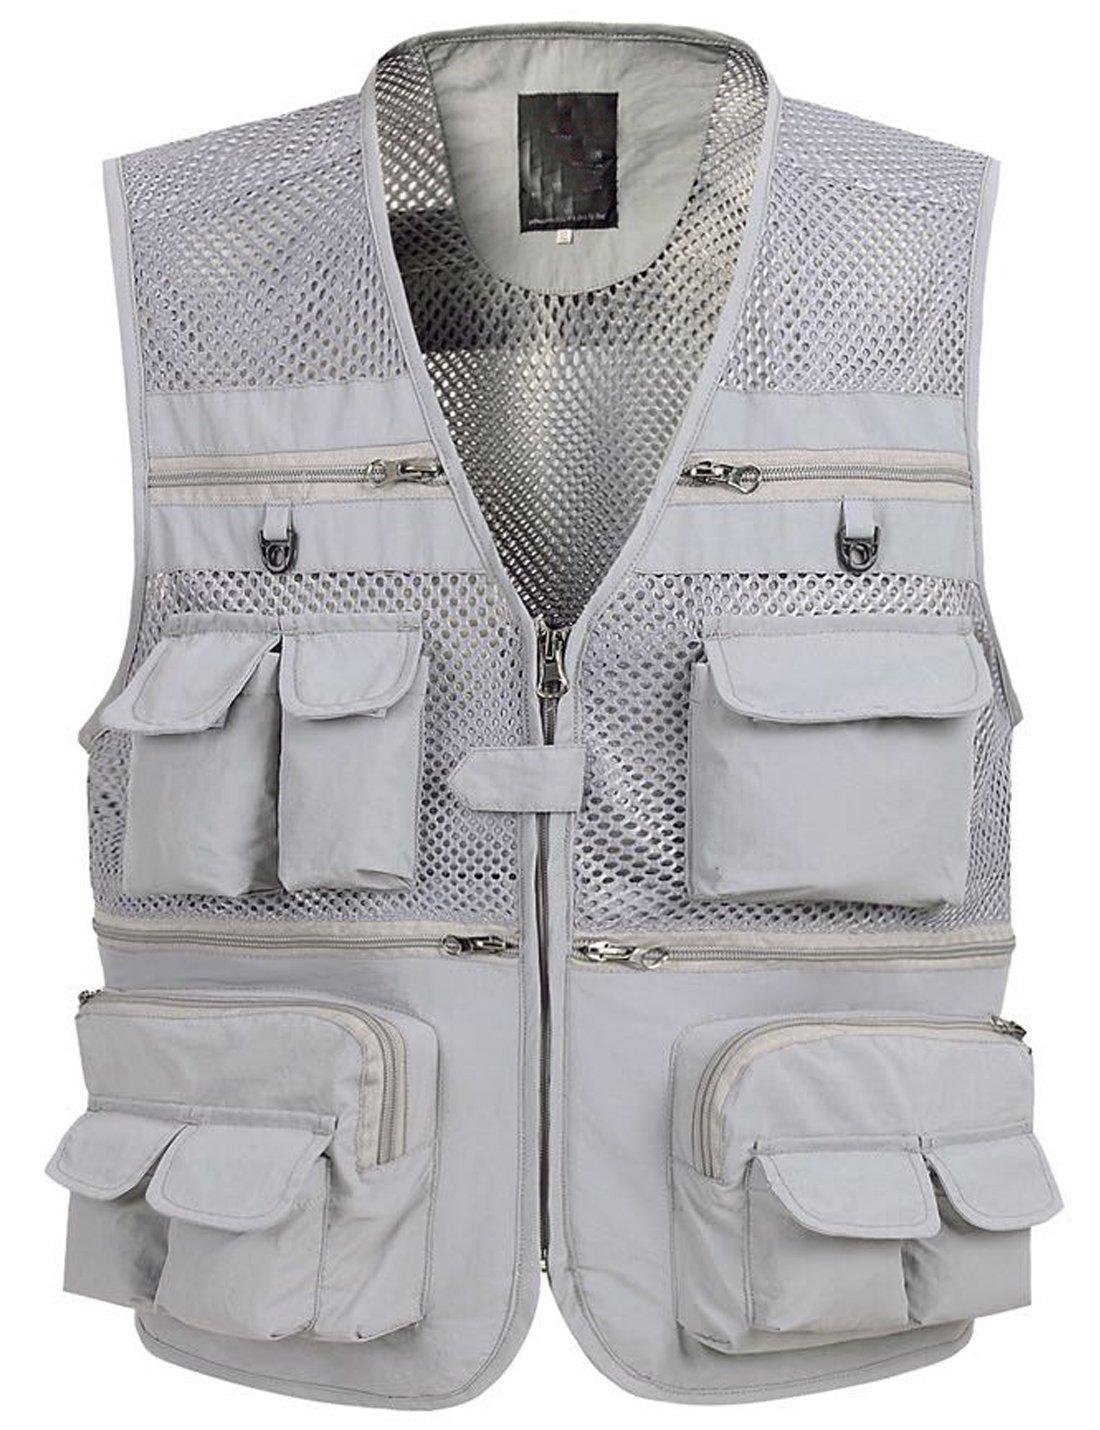 Zhusheng Men's Mesh 16 Pockets Photography Fishing Travel Outdoor Quick Dry Vest Breathable Waistcoat Jackets (XX-Large, Grey)